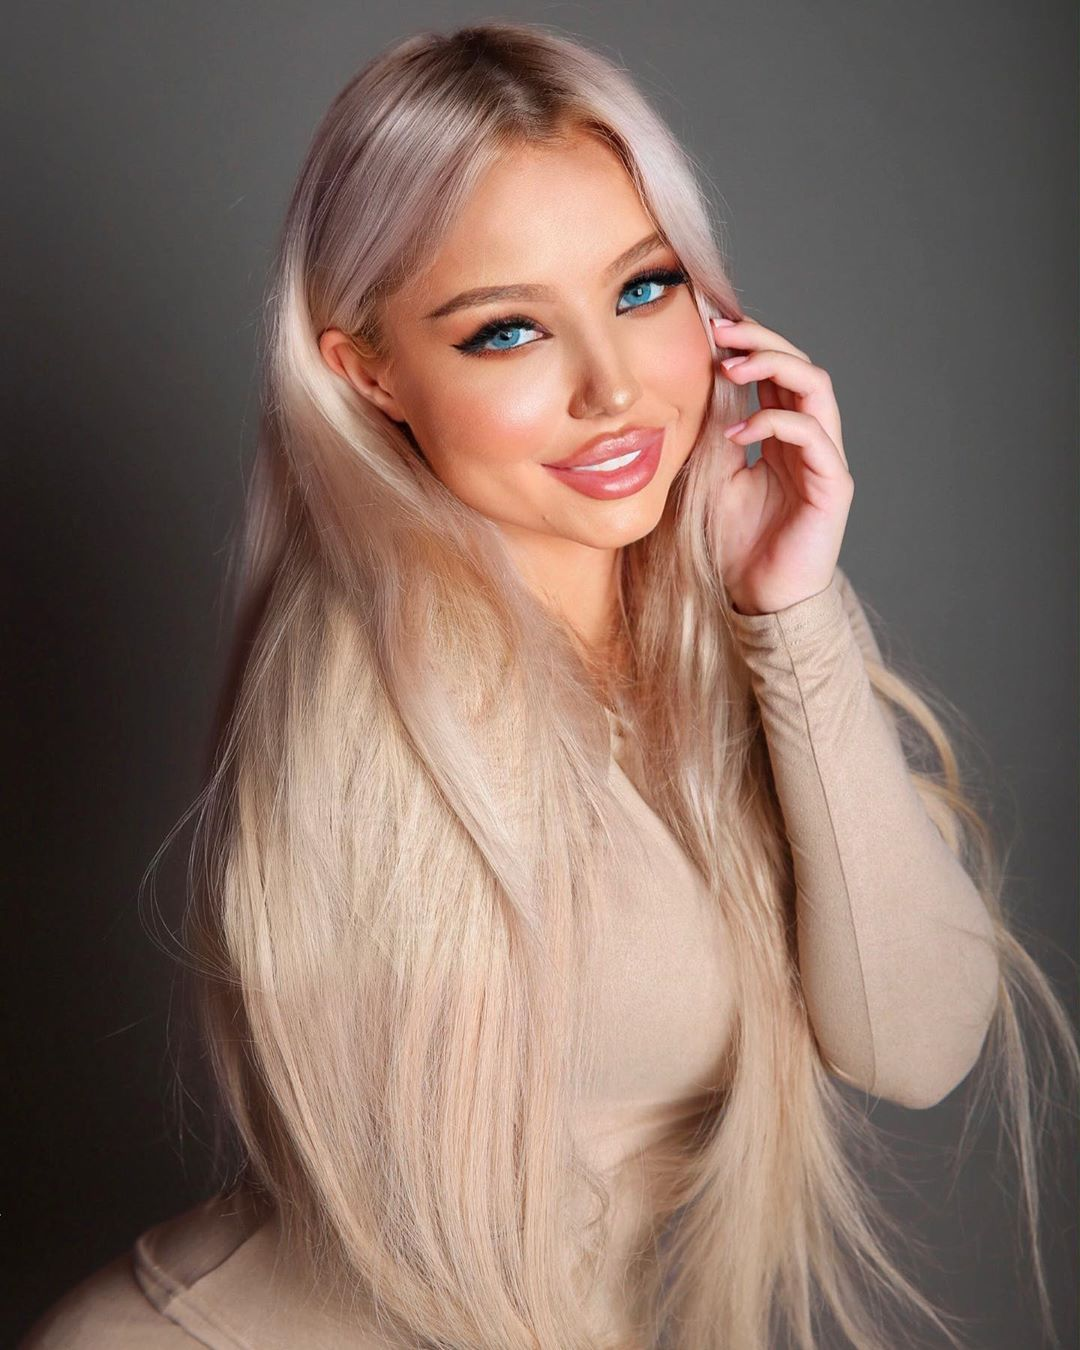 Kristina-Musatova-Wallpapers-Insta-Biography-6